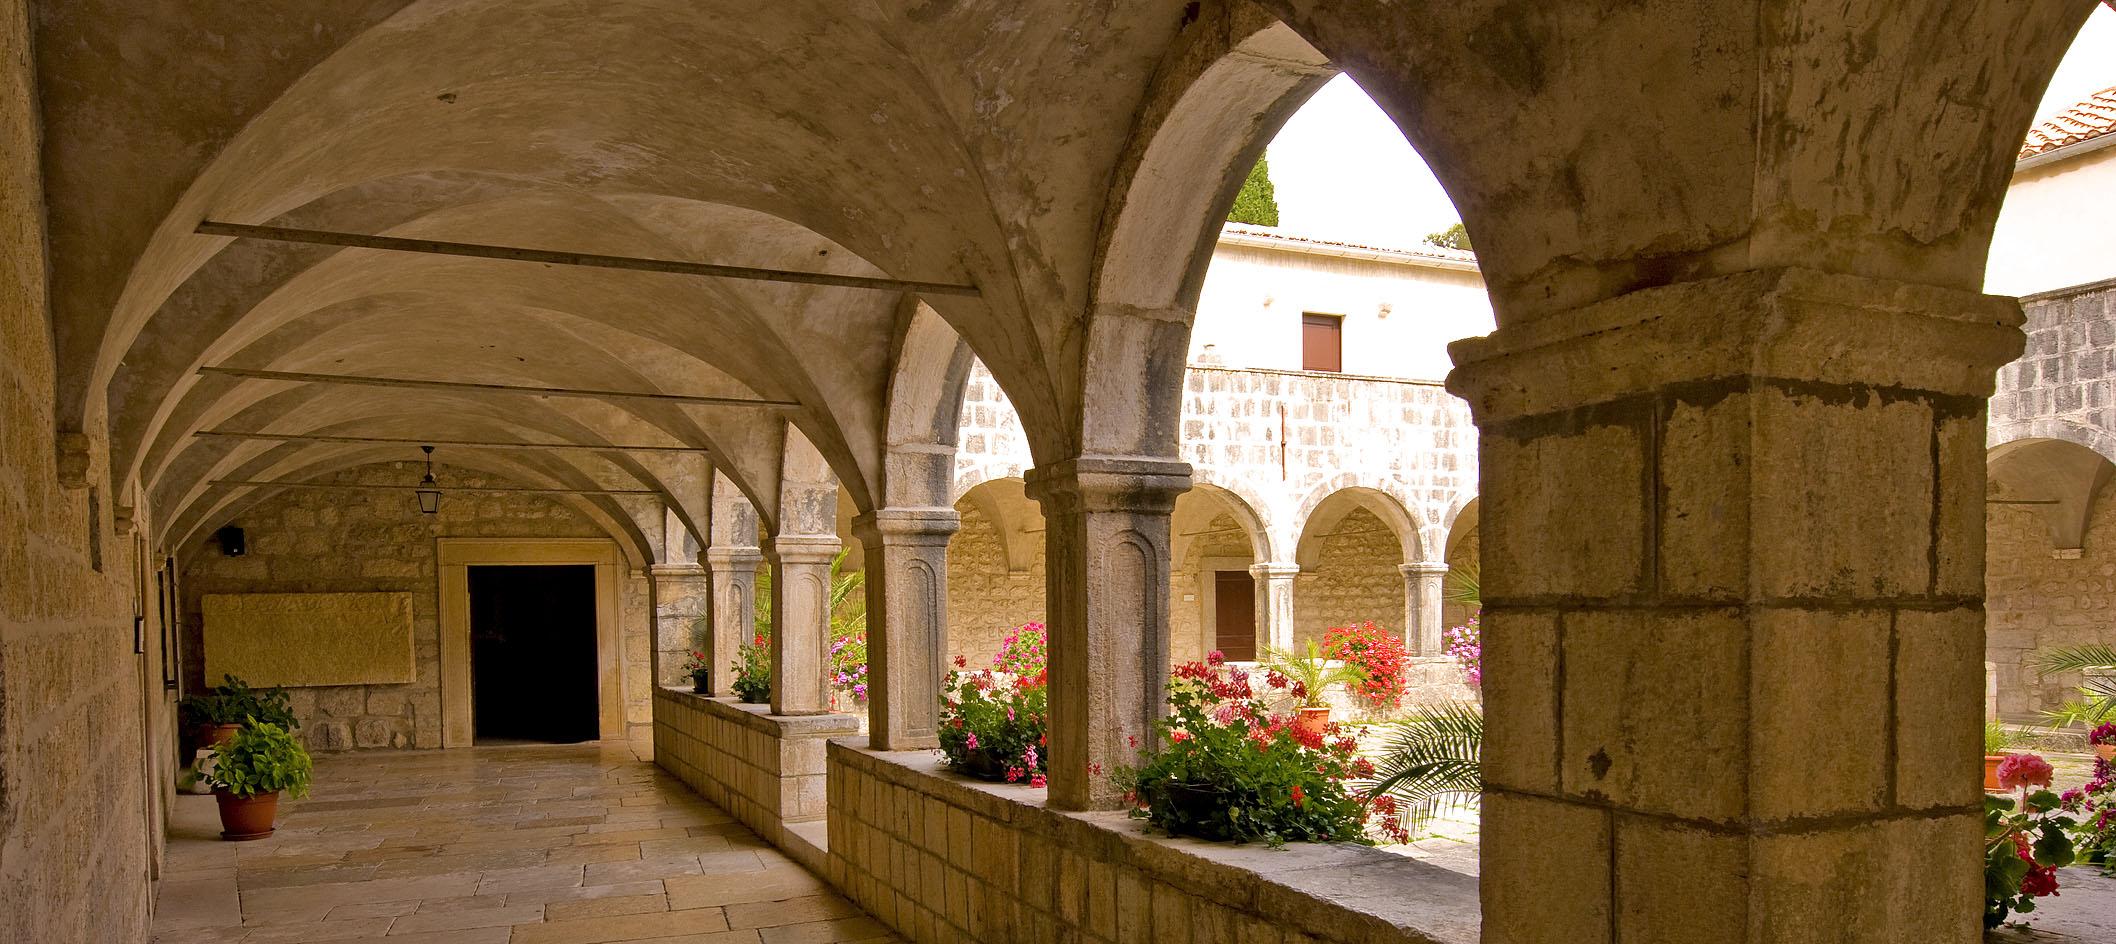 Franziskanerkloster Koslium